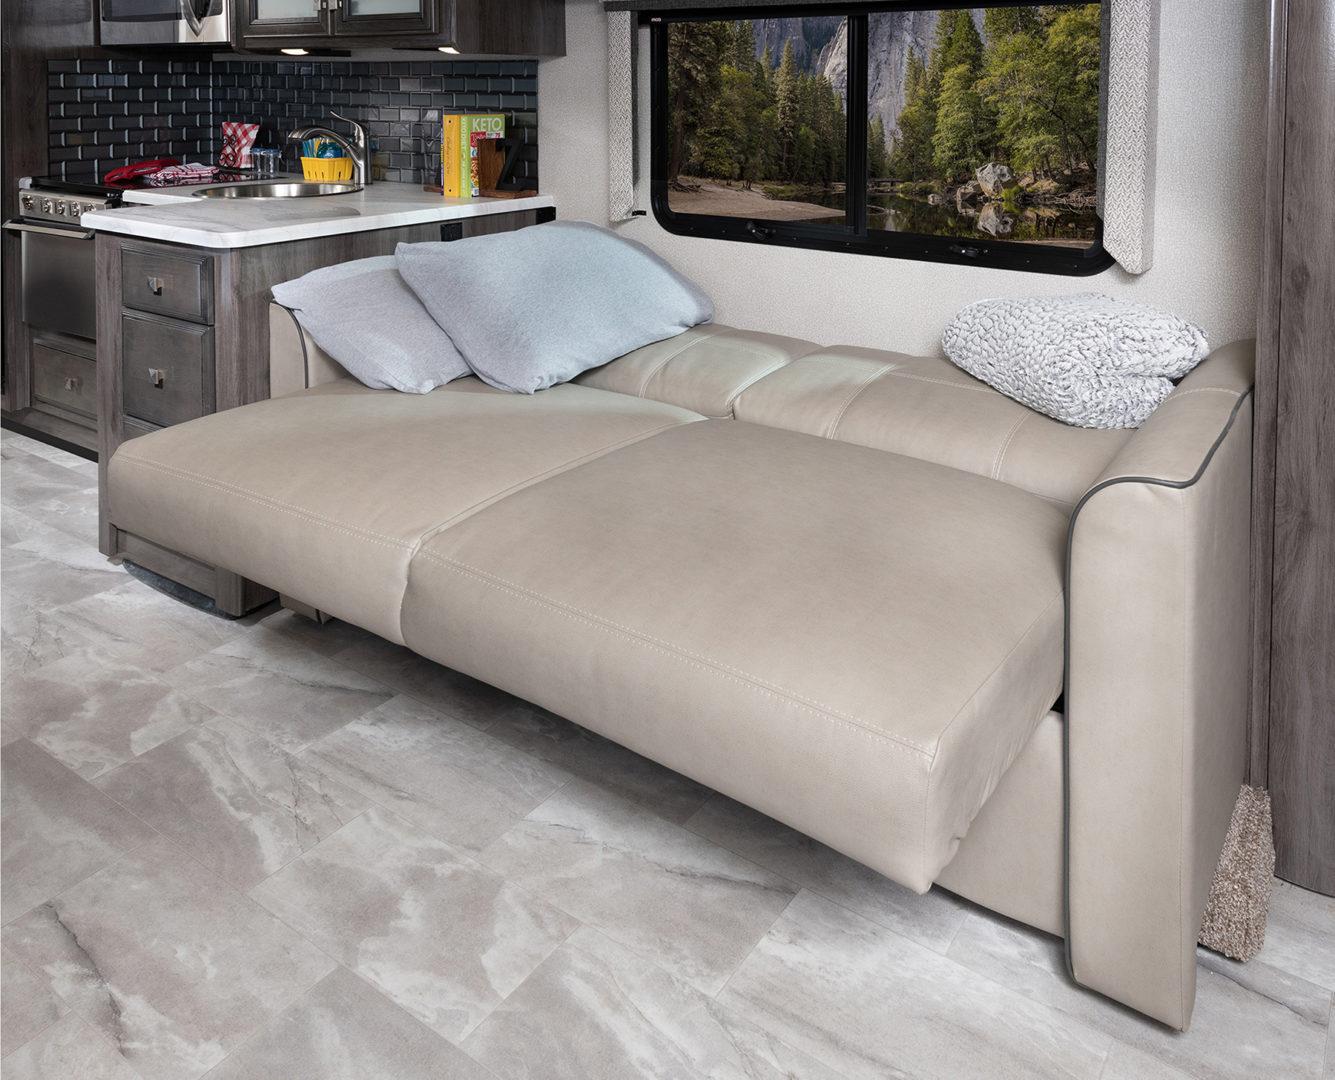 7 sofa bed Admiral29 M moonscapewhispwind573 MY21